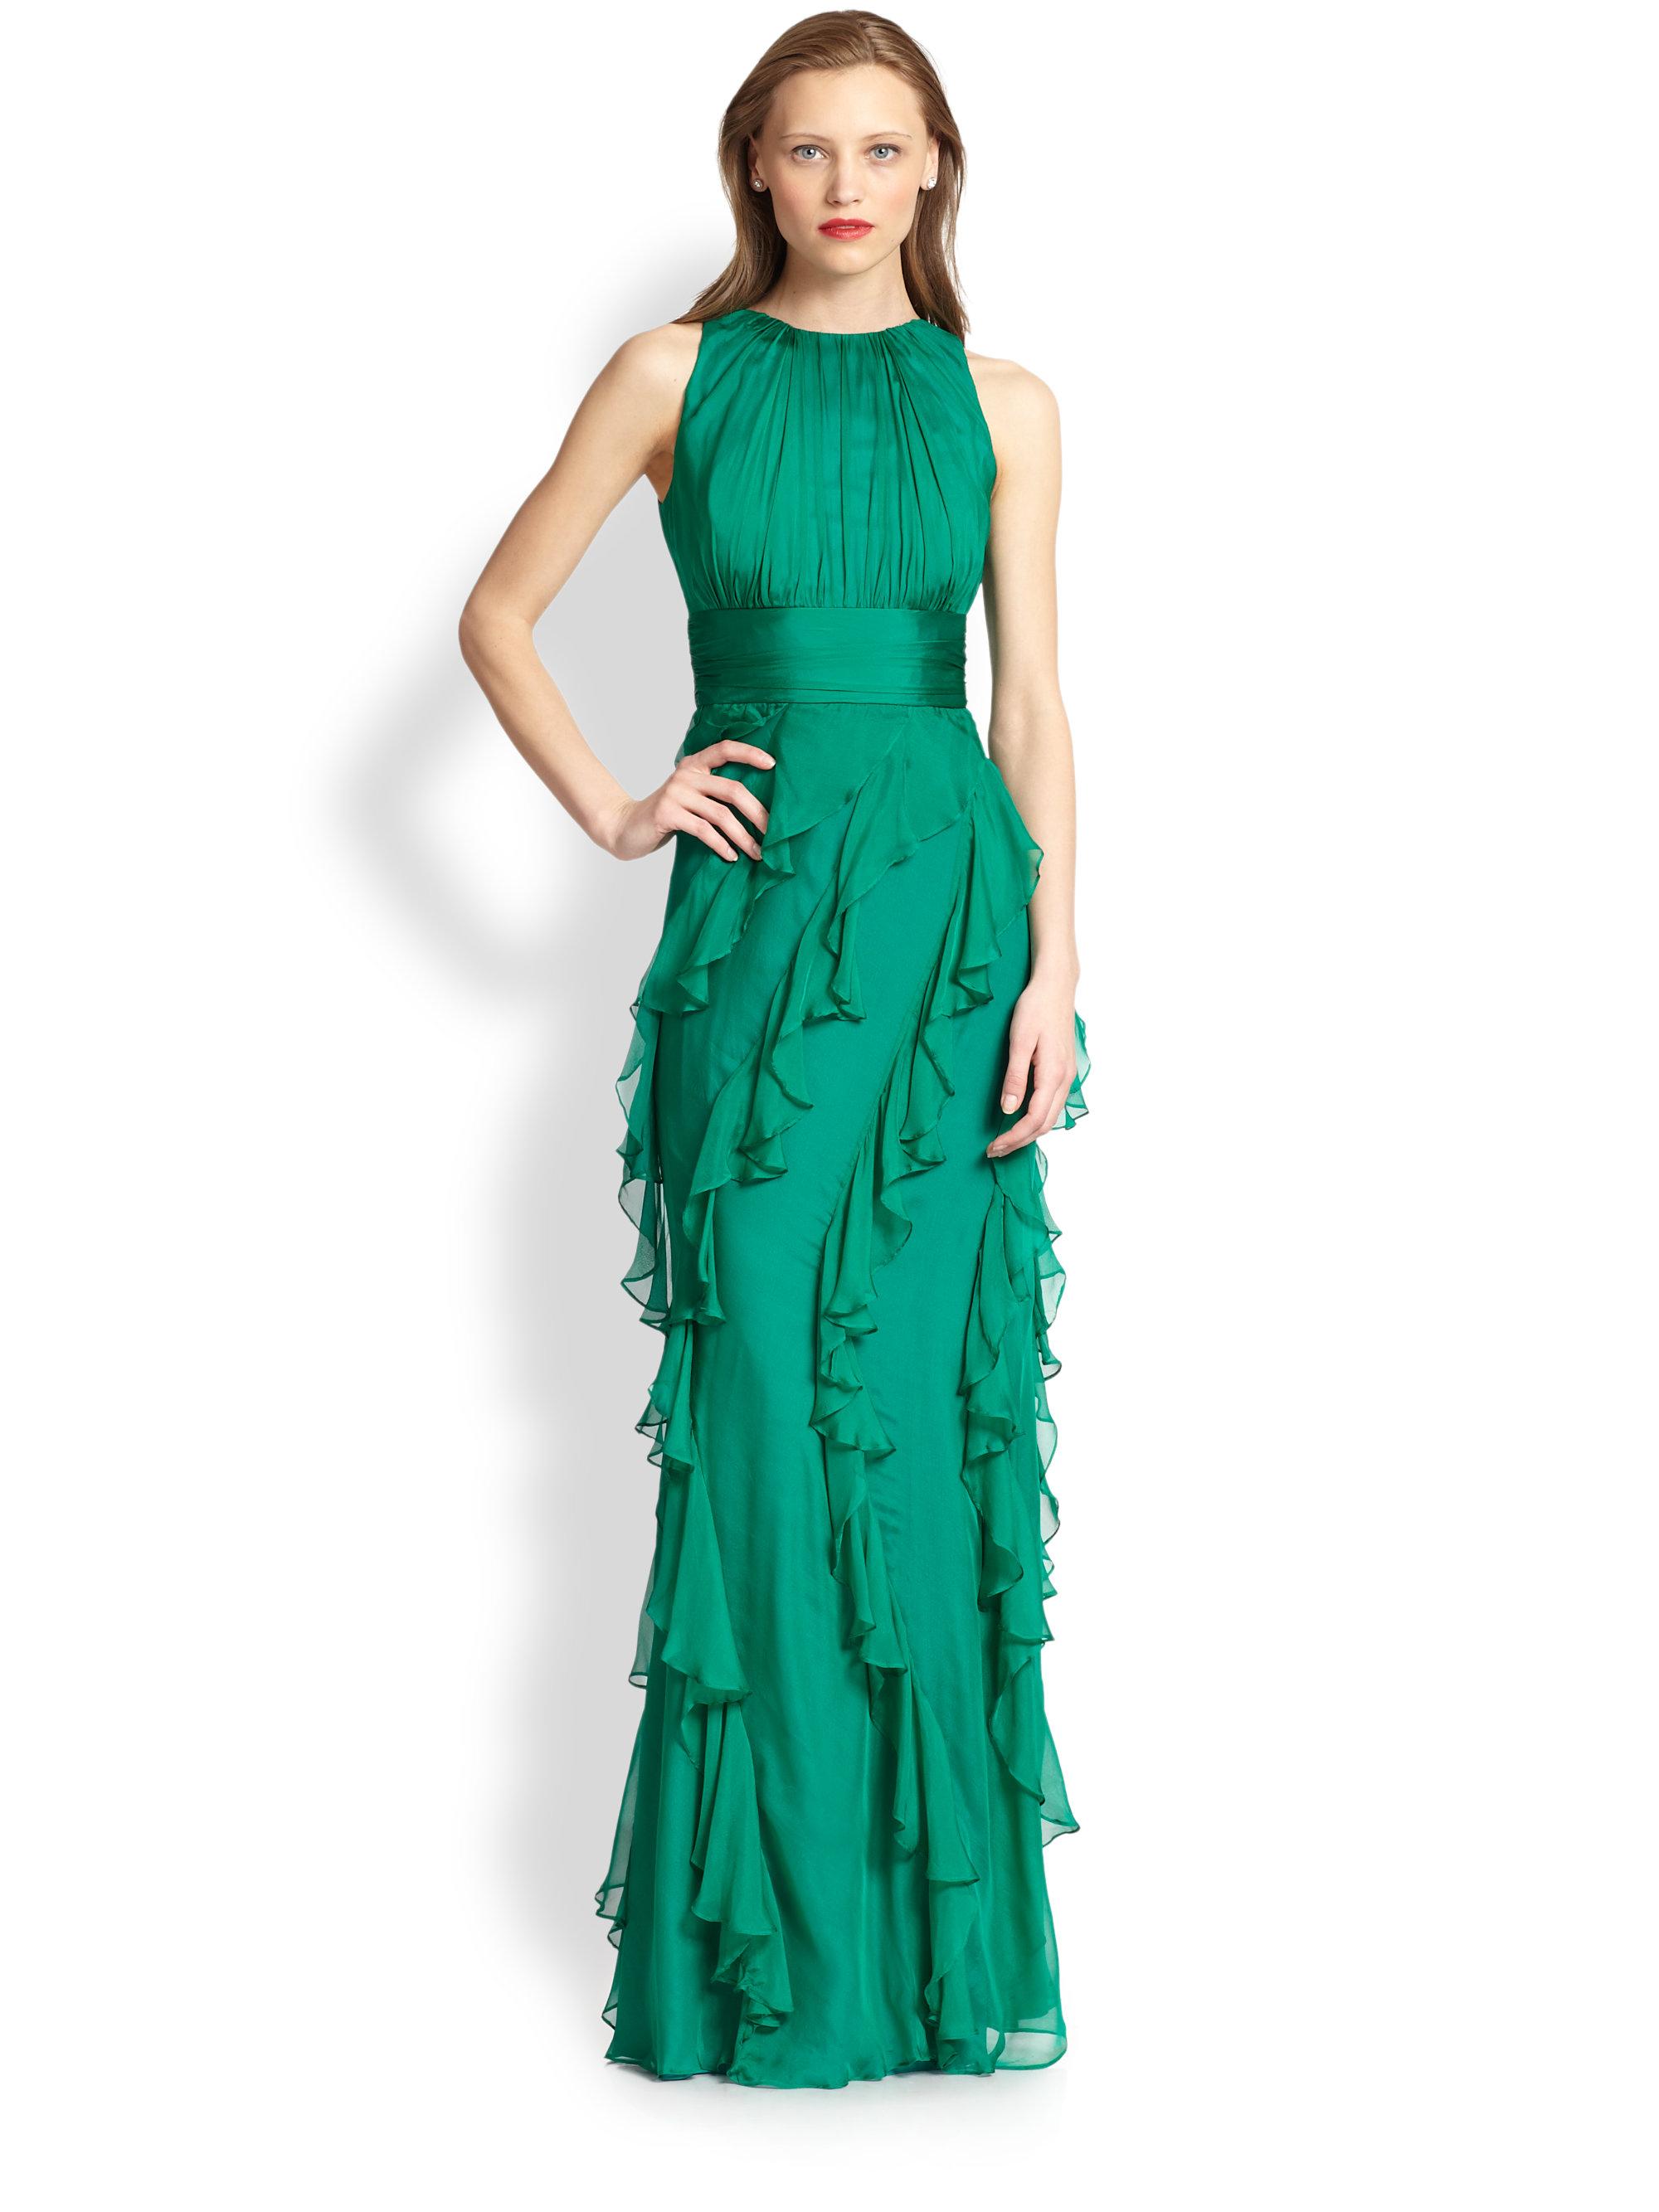 Lyst - Badgley Mischka Silk Ruffle Gown in Green